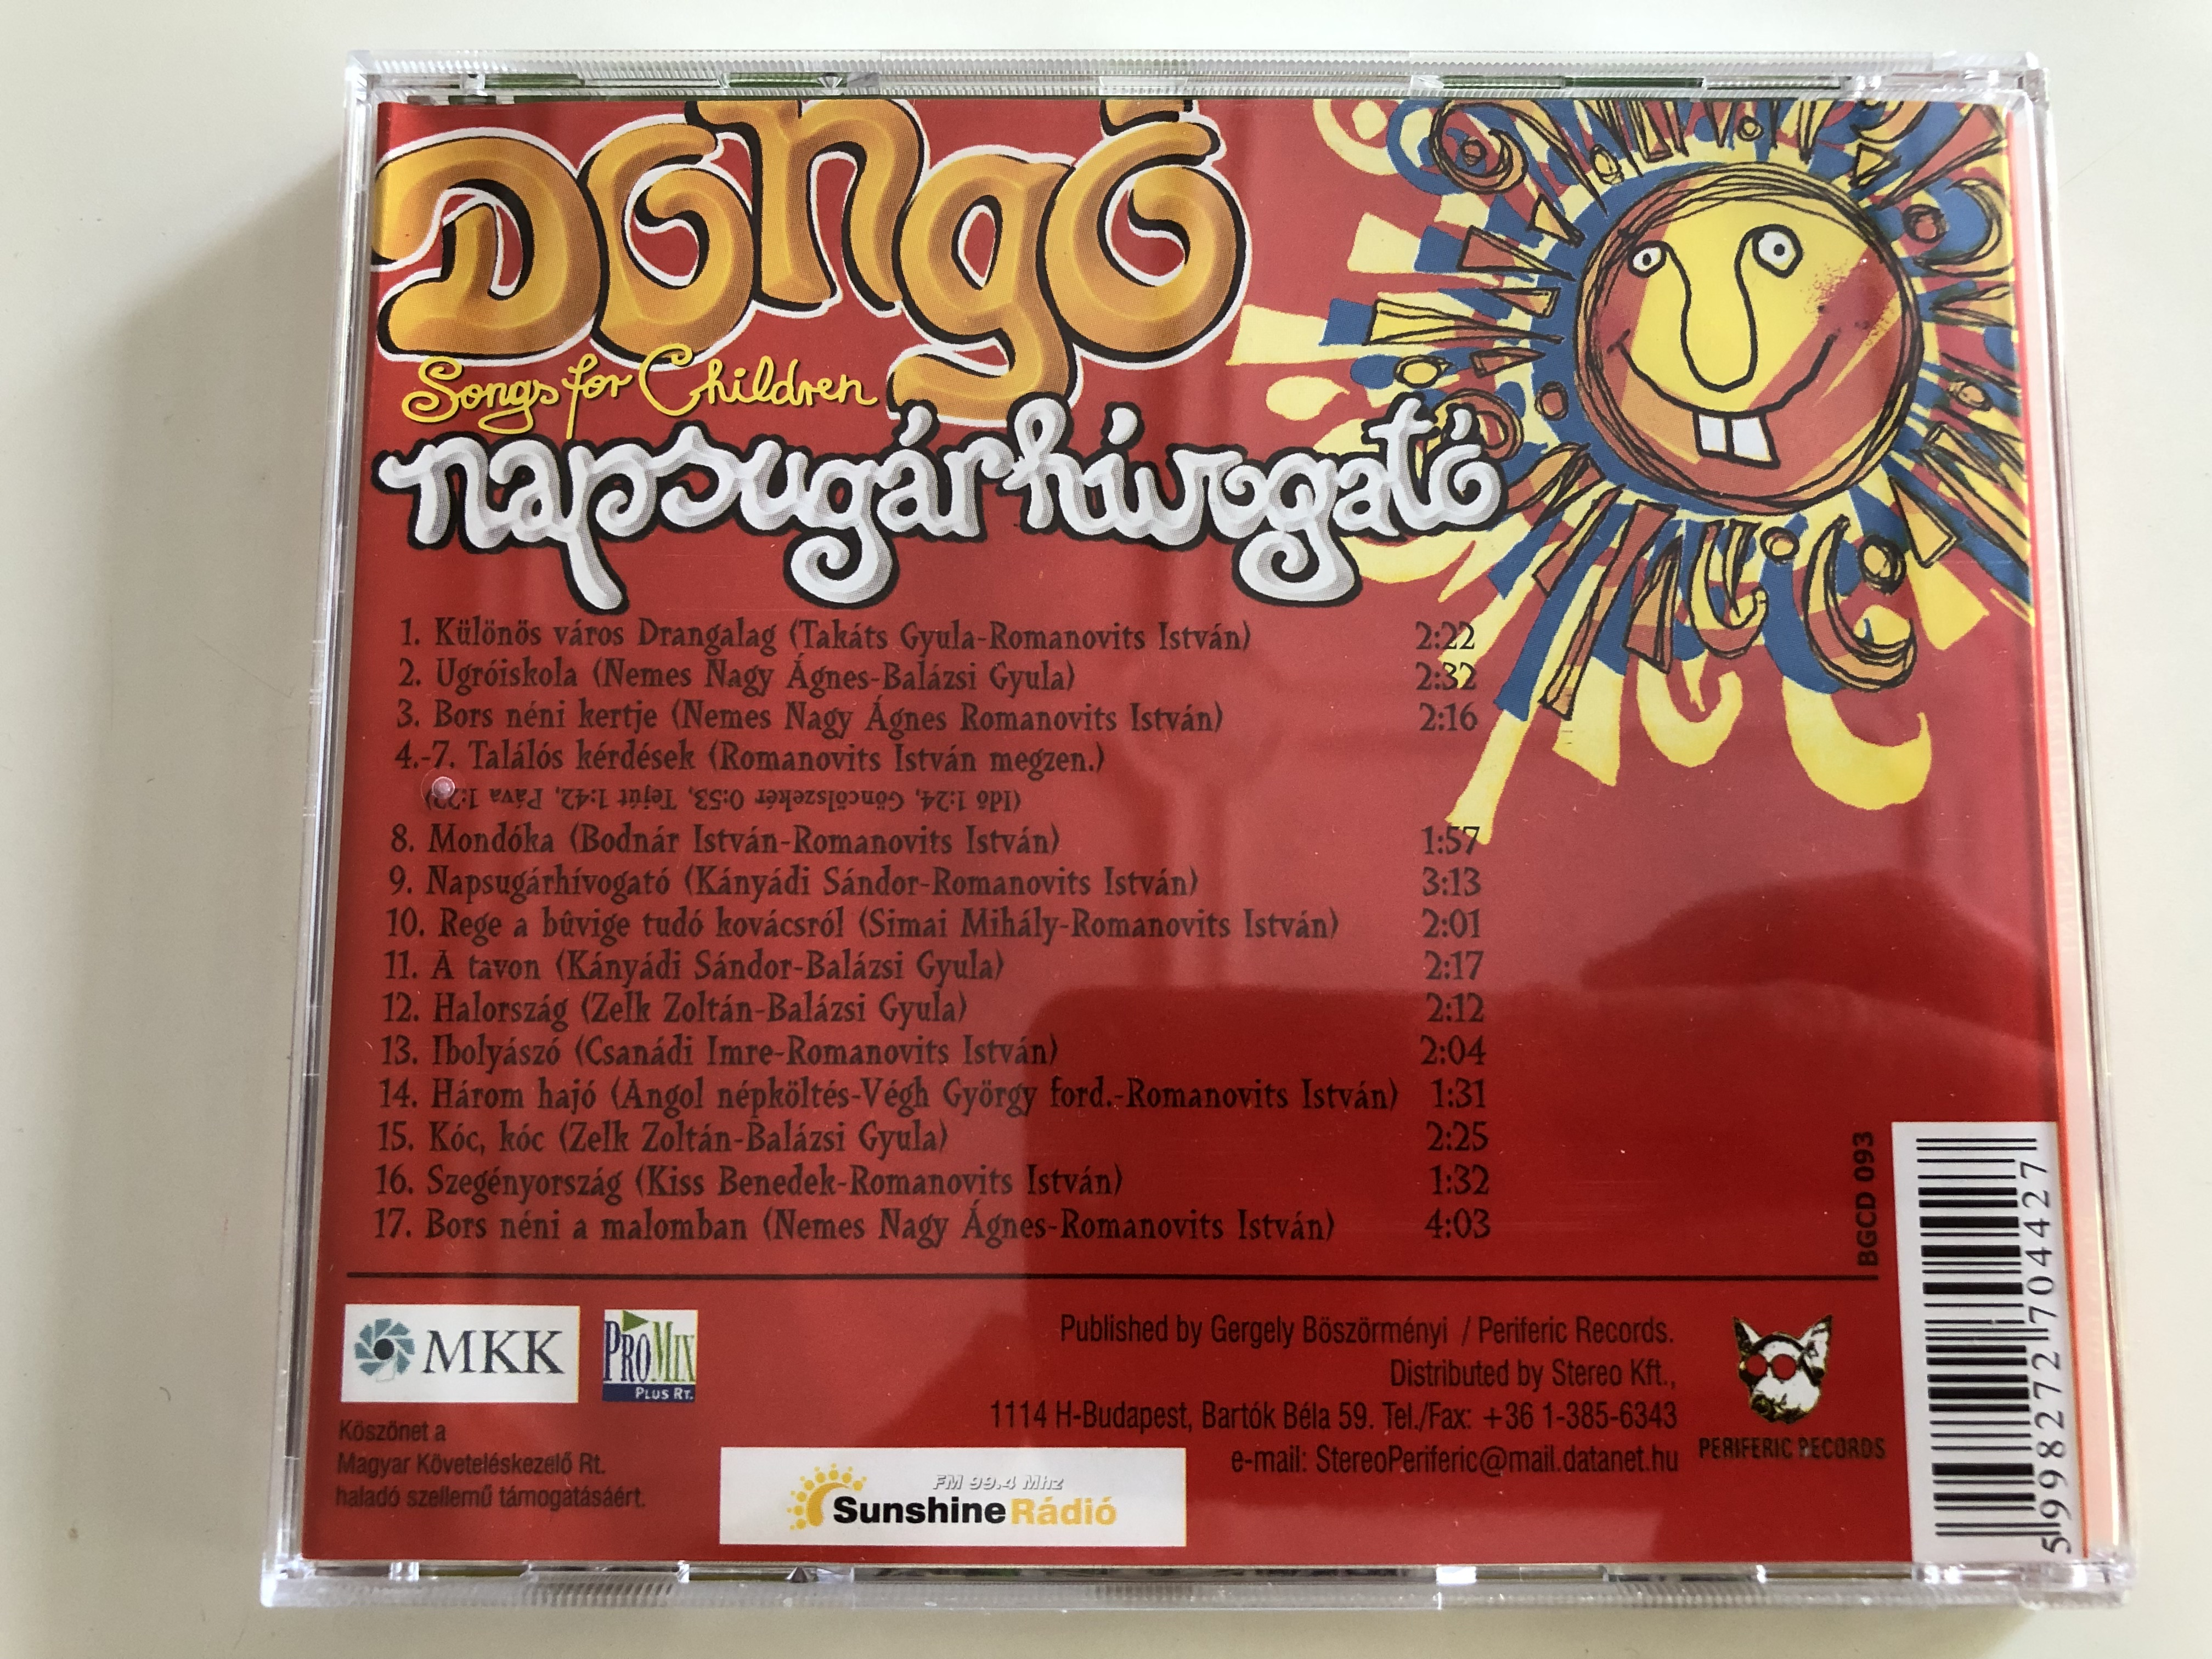 dong-dalok-gyerekeknek-napsug-r-h-vogat-come-forth-sunshine-hungarian-children-s-songs-audio-cd-2001-bgcd-093-8-.jpg